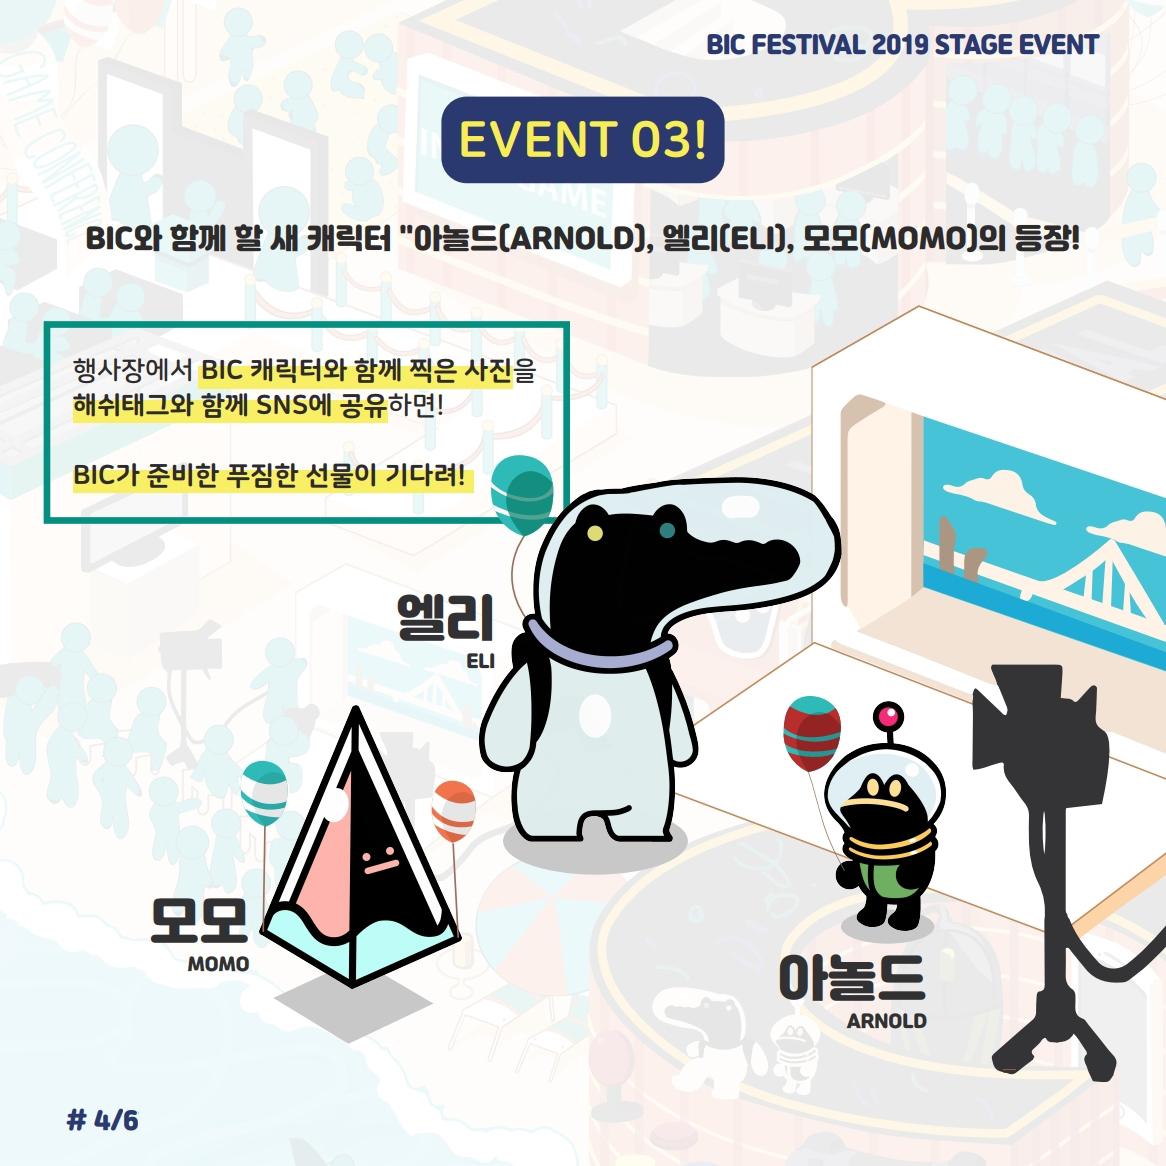 BIC_cardnews_01_Event_04.jpg